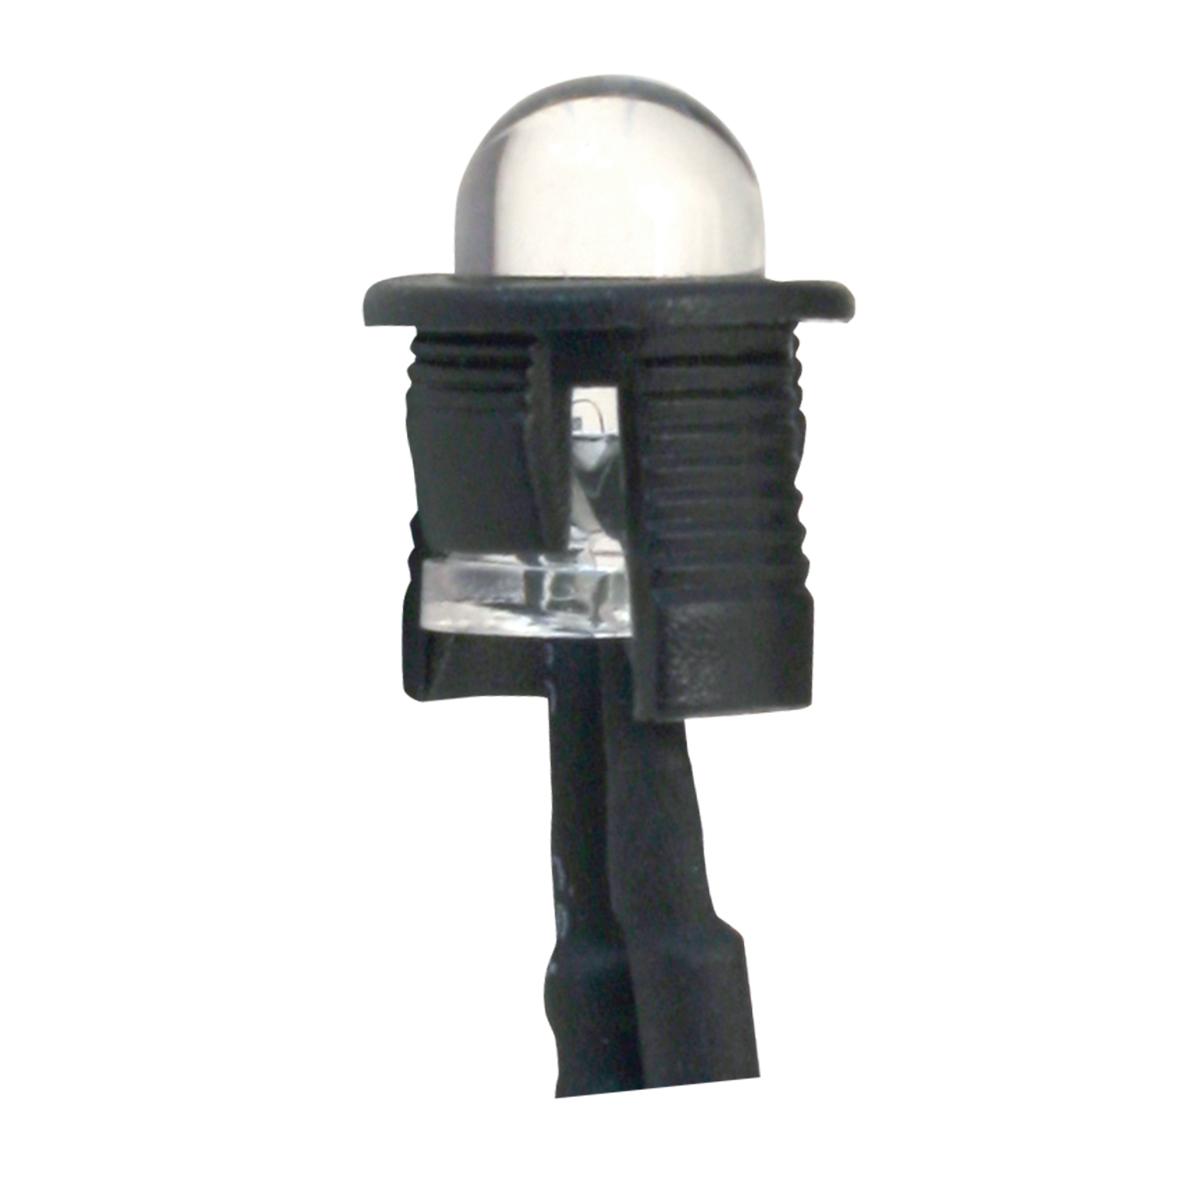 Single Amber LED Light Bulb – Unlit View